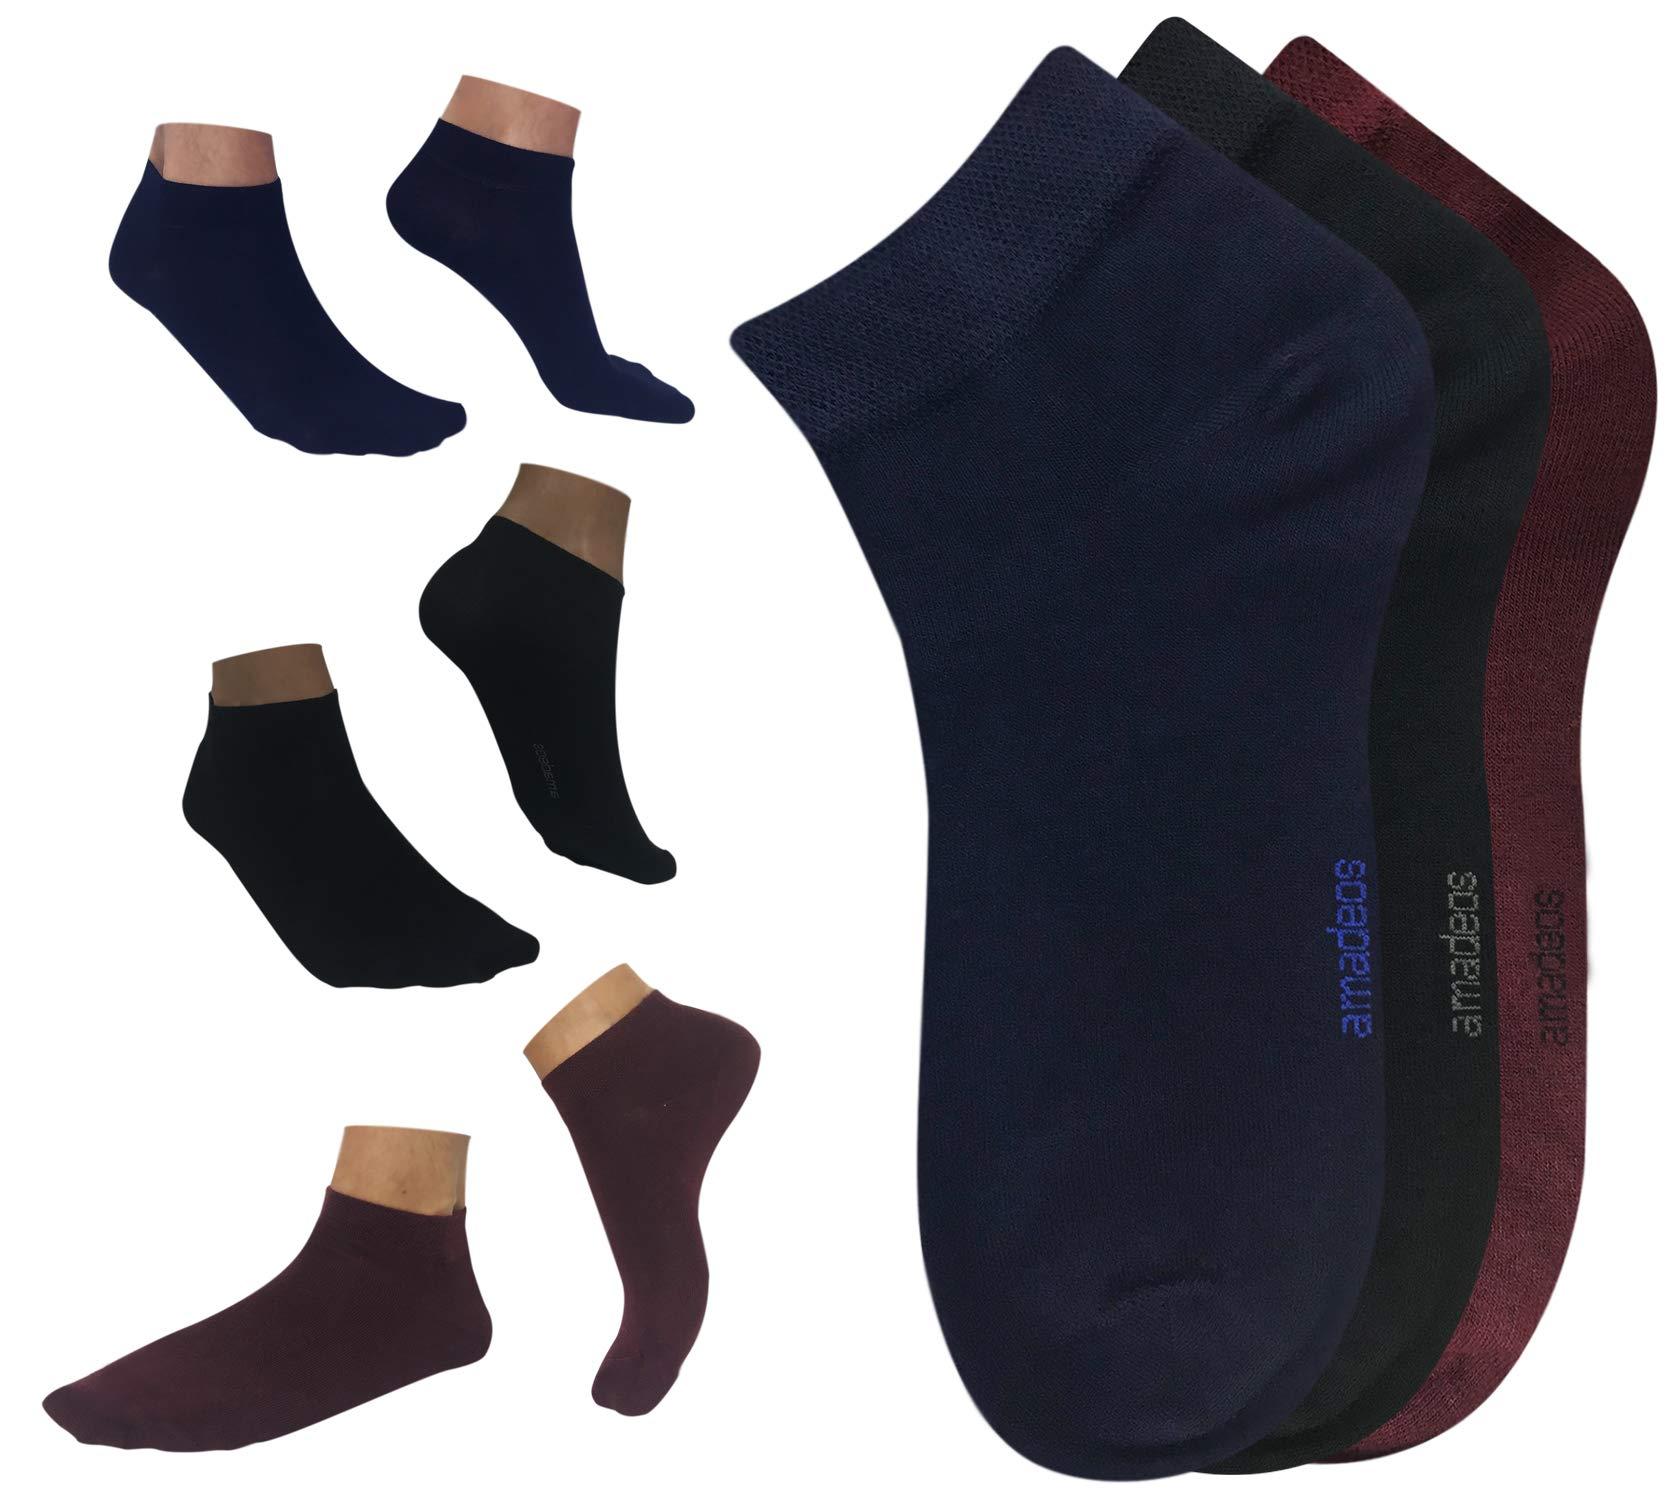 Calcetines cortos hombre mujer de bambu negros Amadeos Ecologicos product image